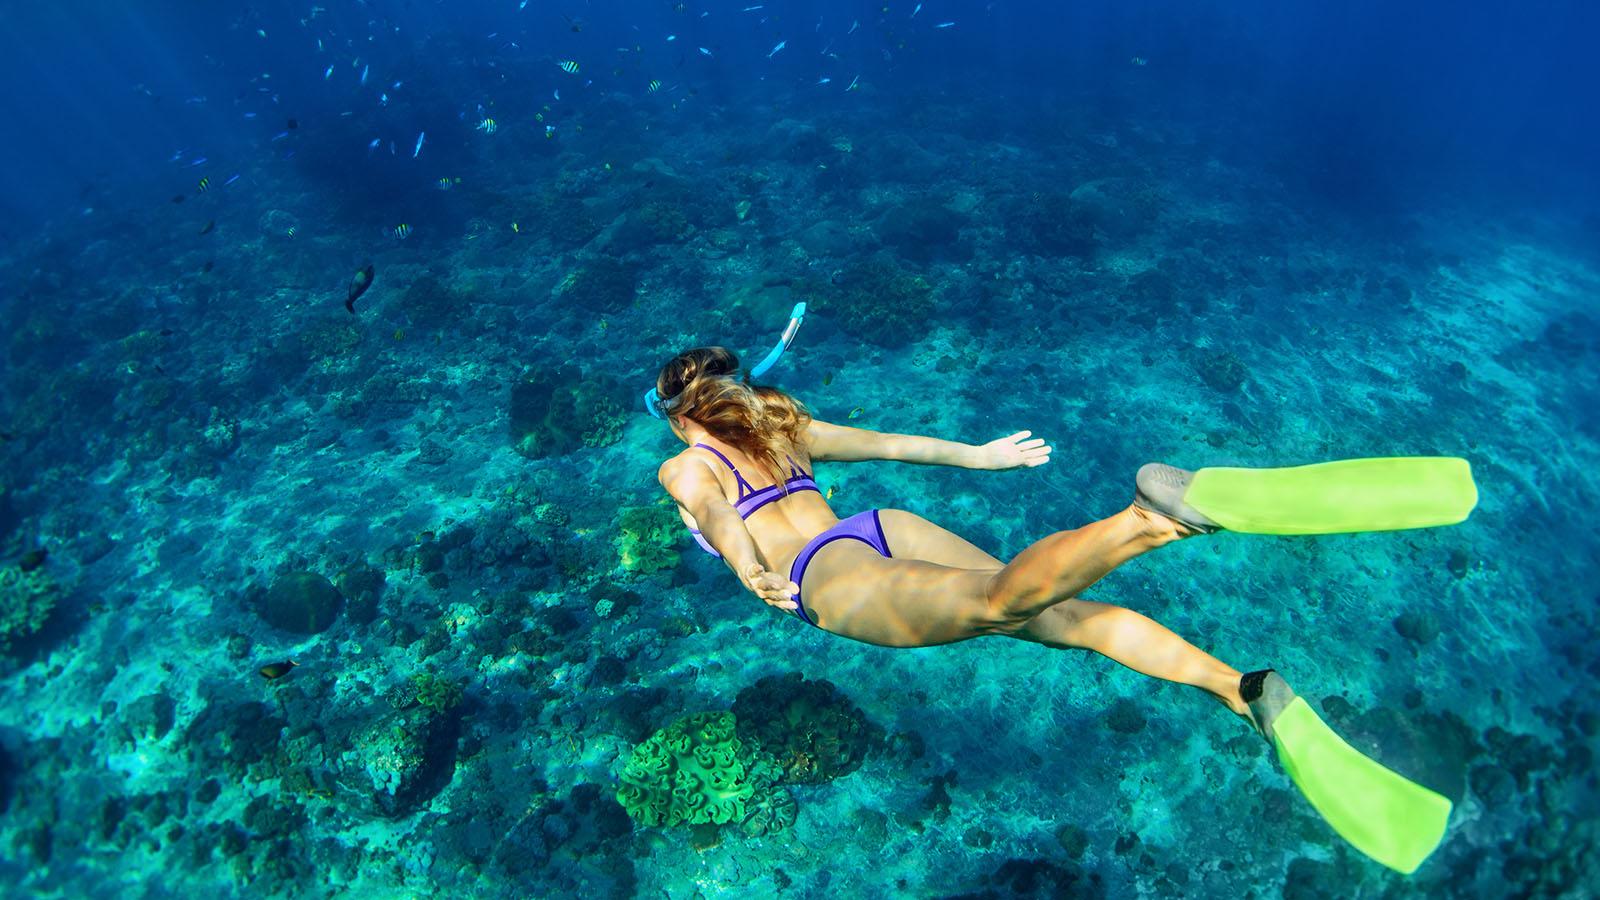 maldives Women_snorkel_1600_900